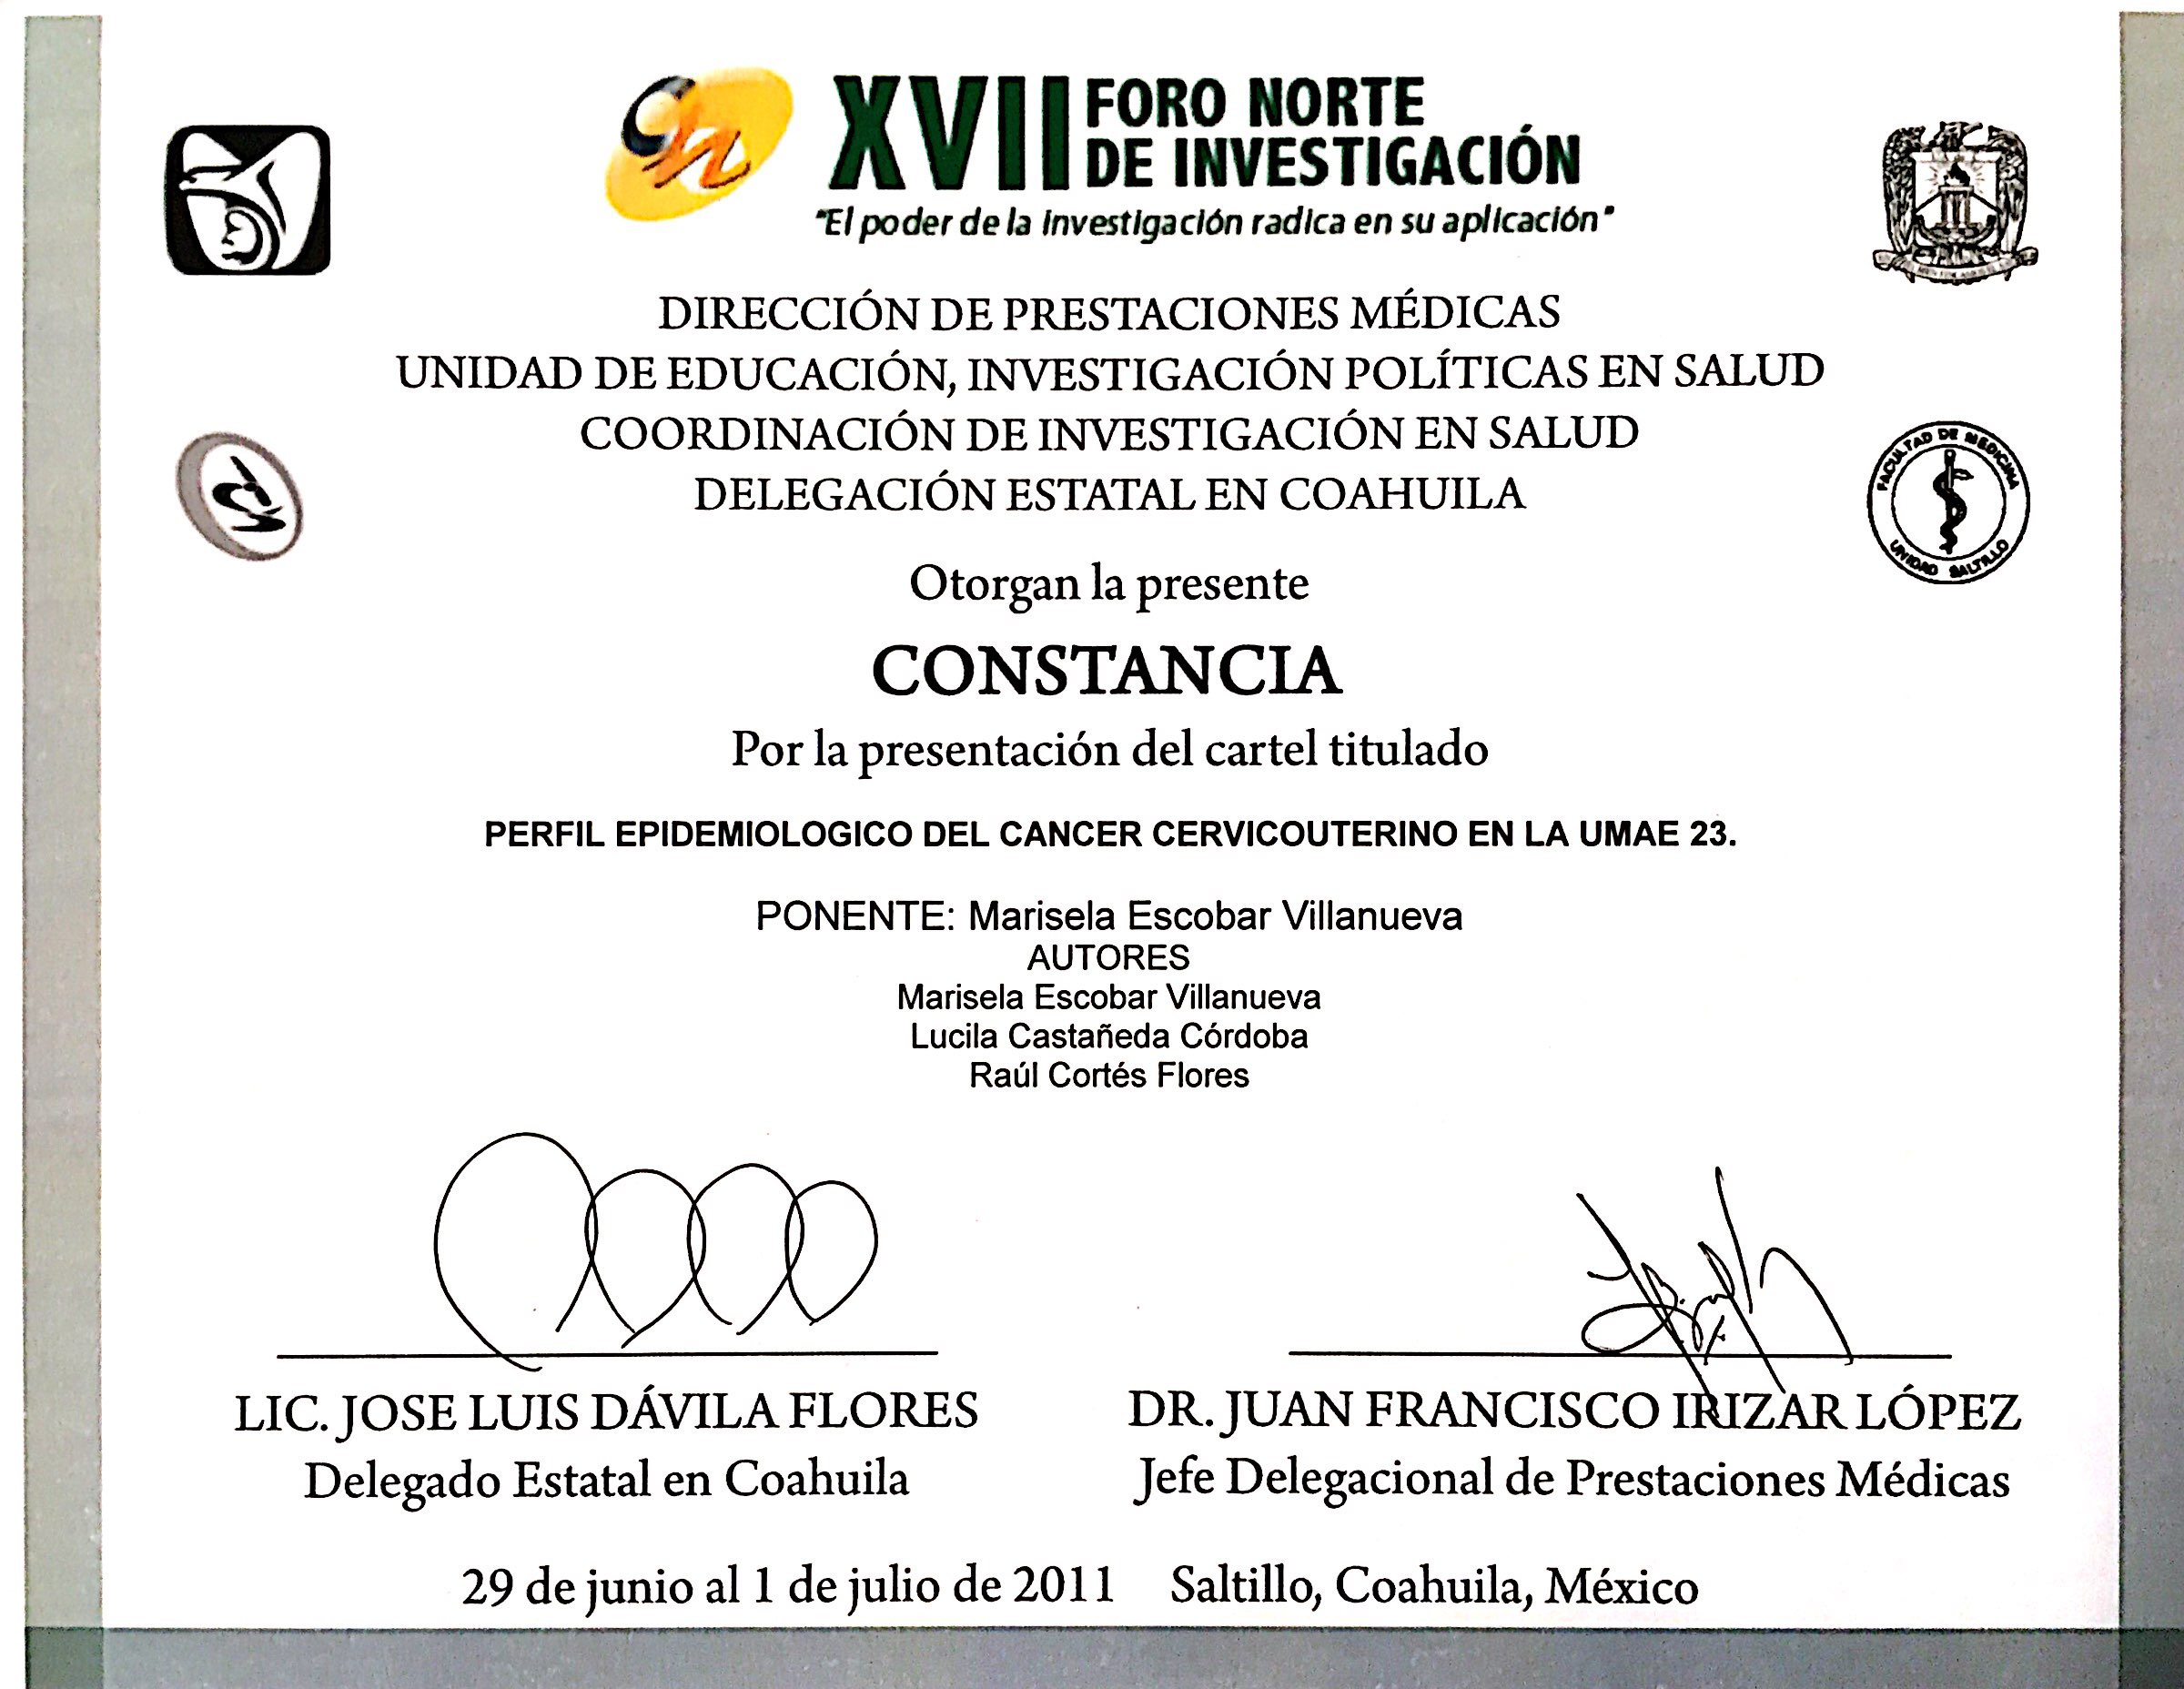 Nuevo doc 2018-02-20 11.21.39_7